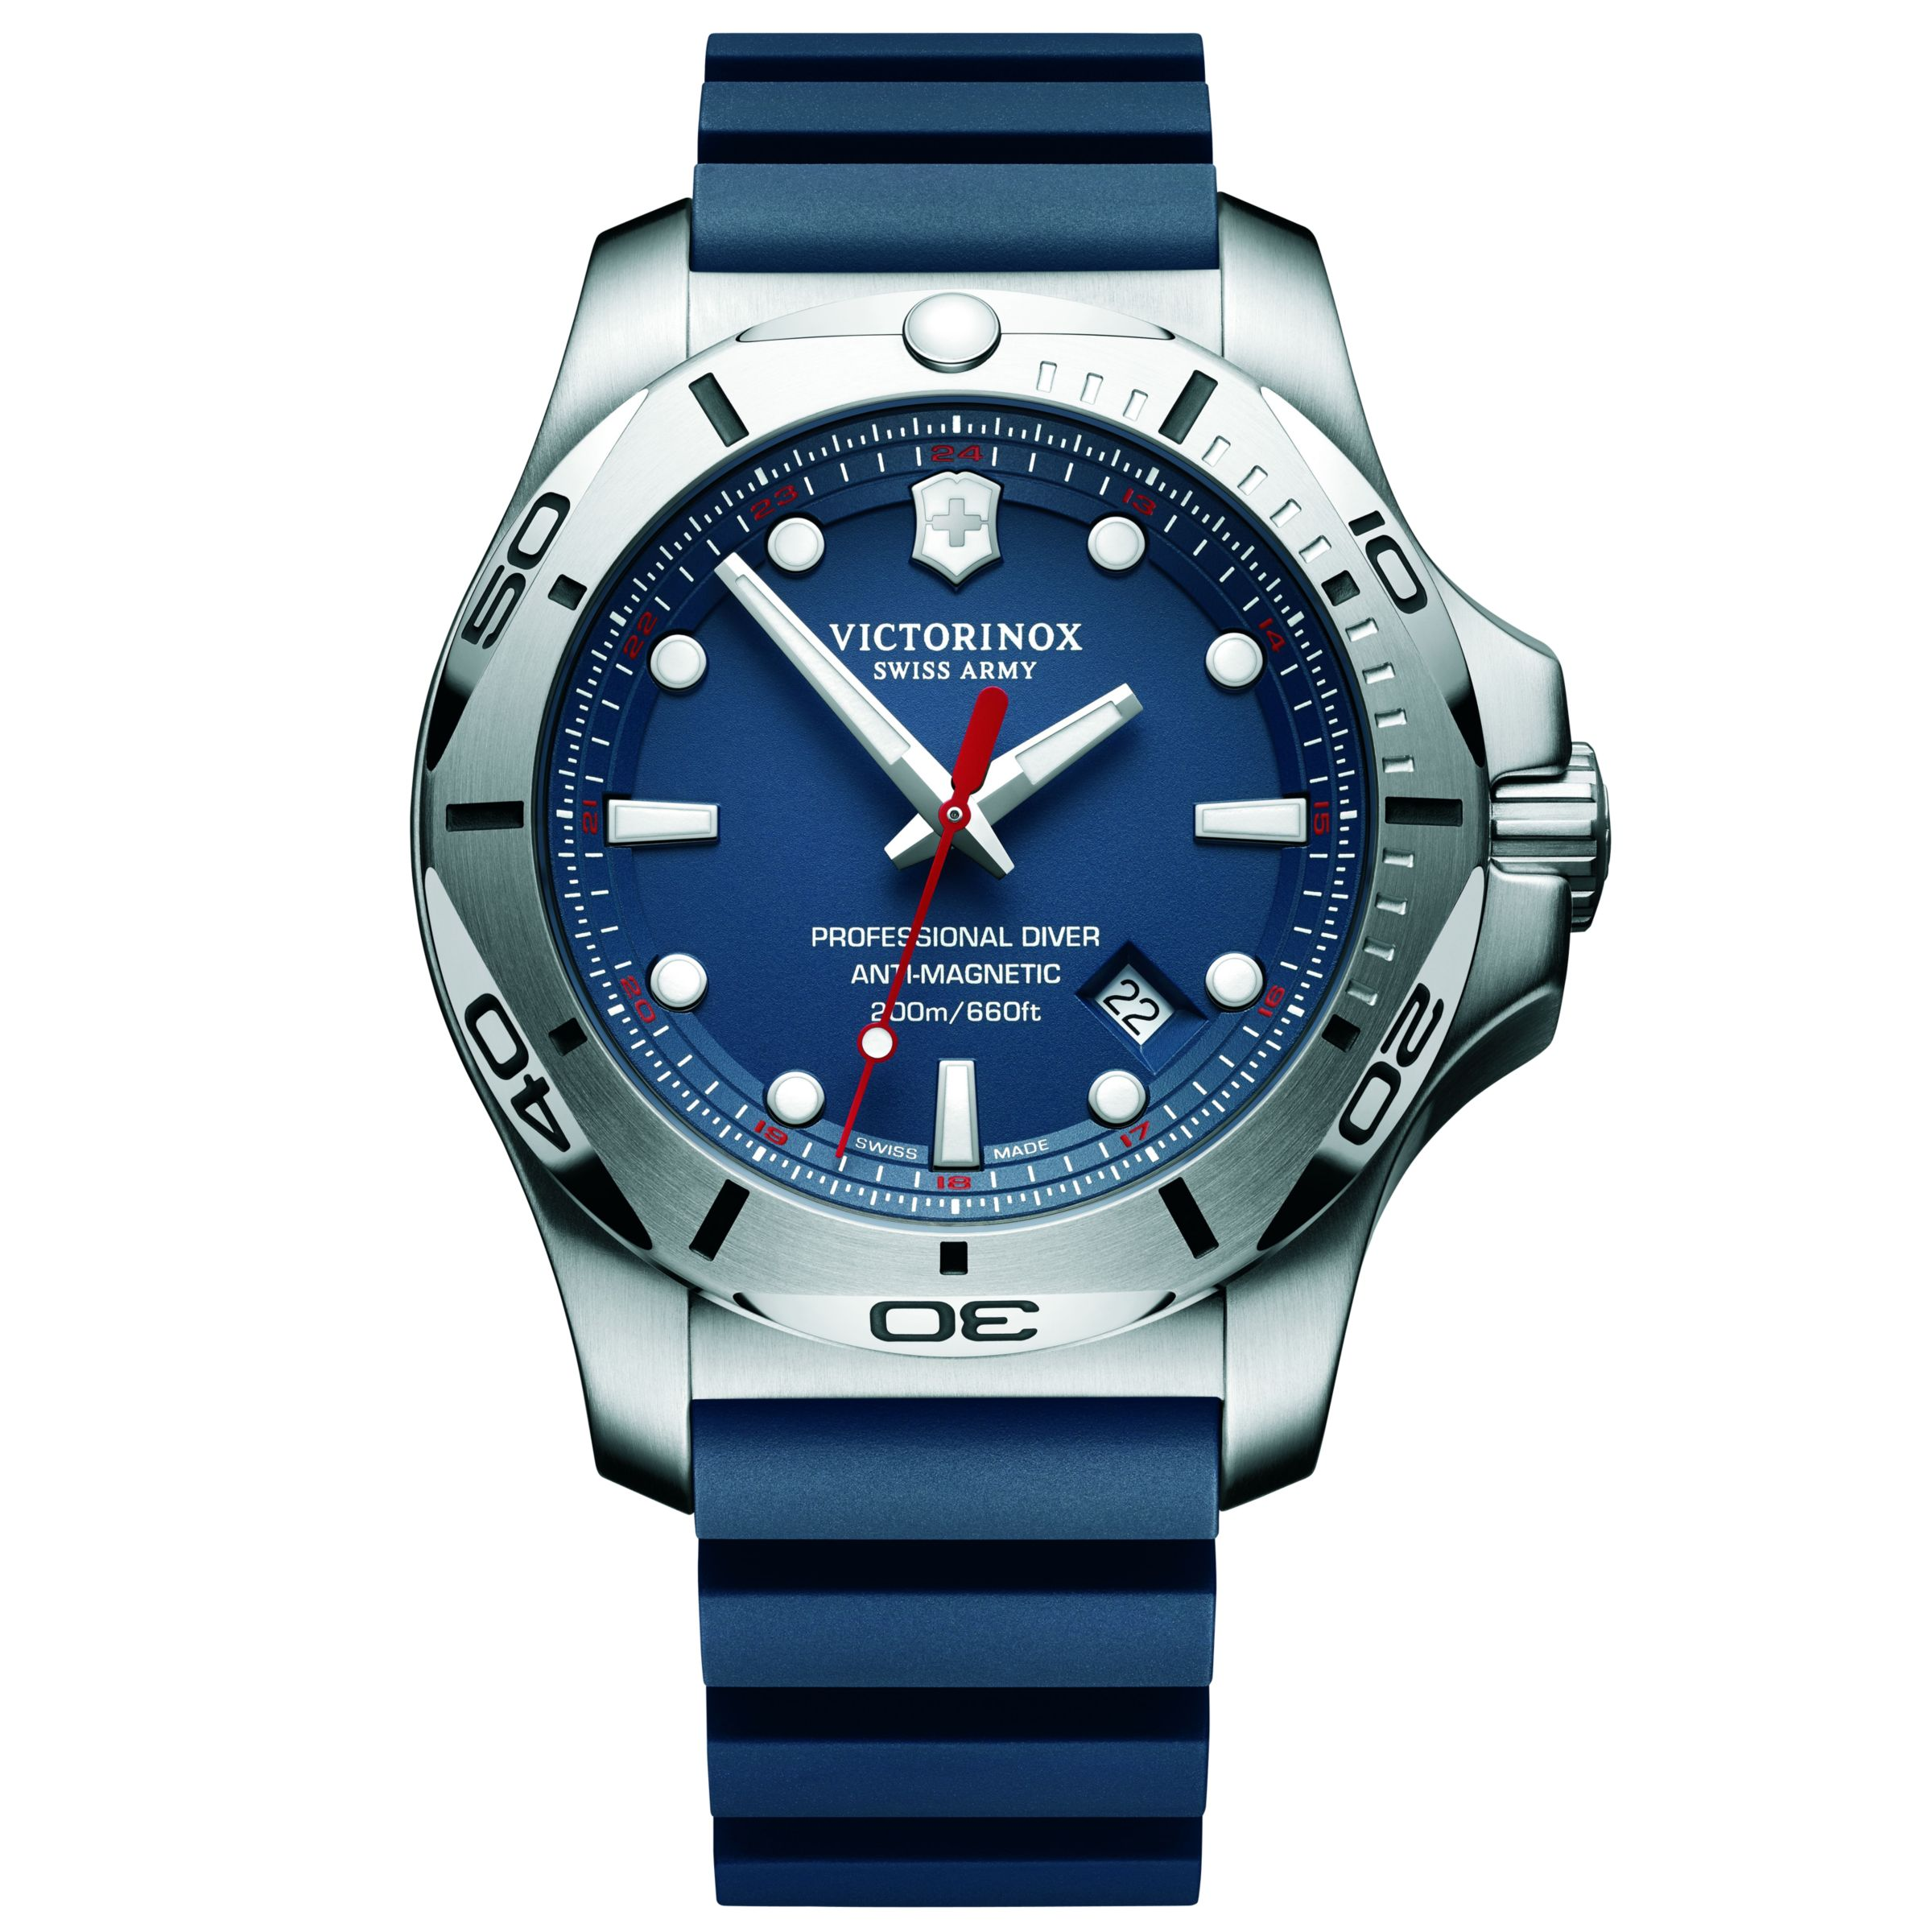 Victorinox Victorinox 241734 Men's I.N.O.X Diver Rubber Strap Watch, Blue